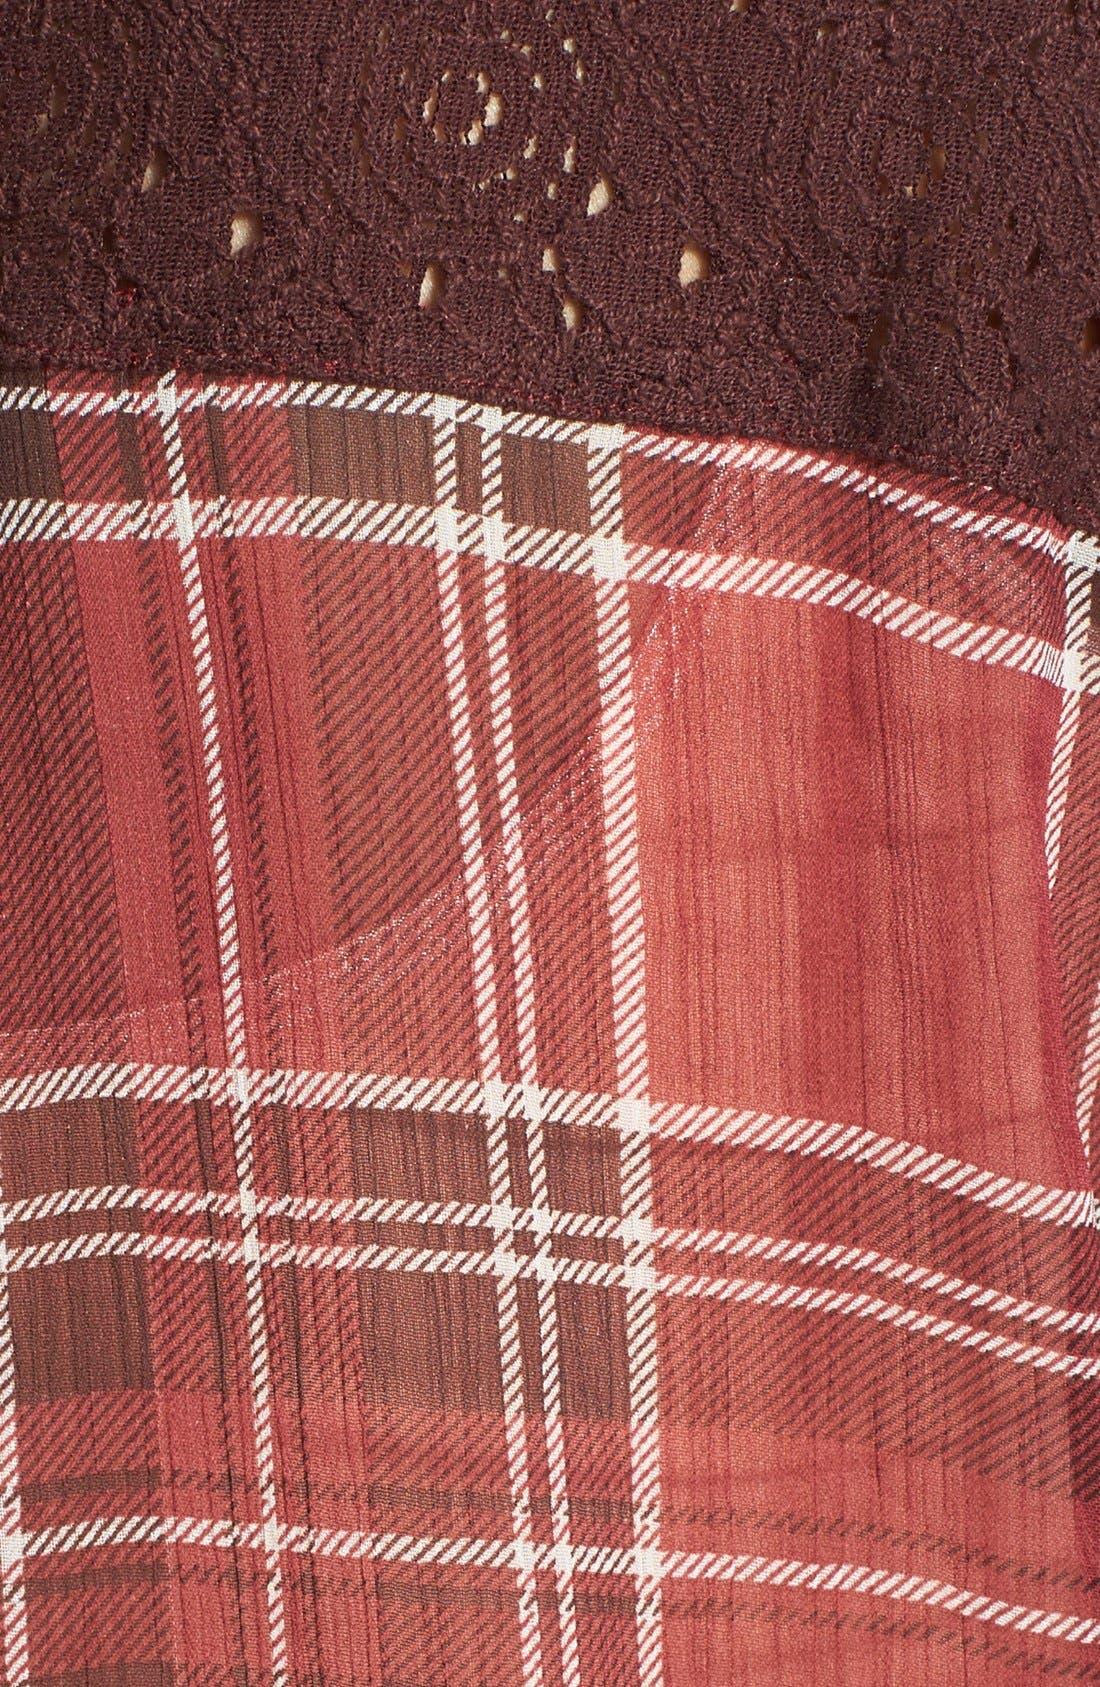 Alternate Image 3  - Band of Gypsies Plaid Crochet Back Yoke Chiffon Shirt (Juniors)